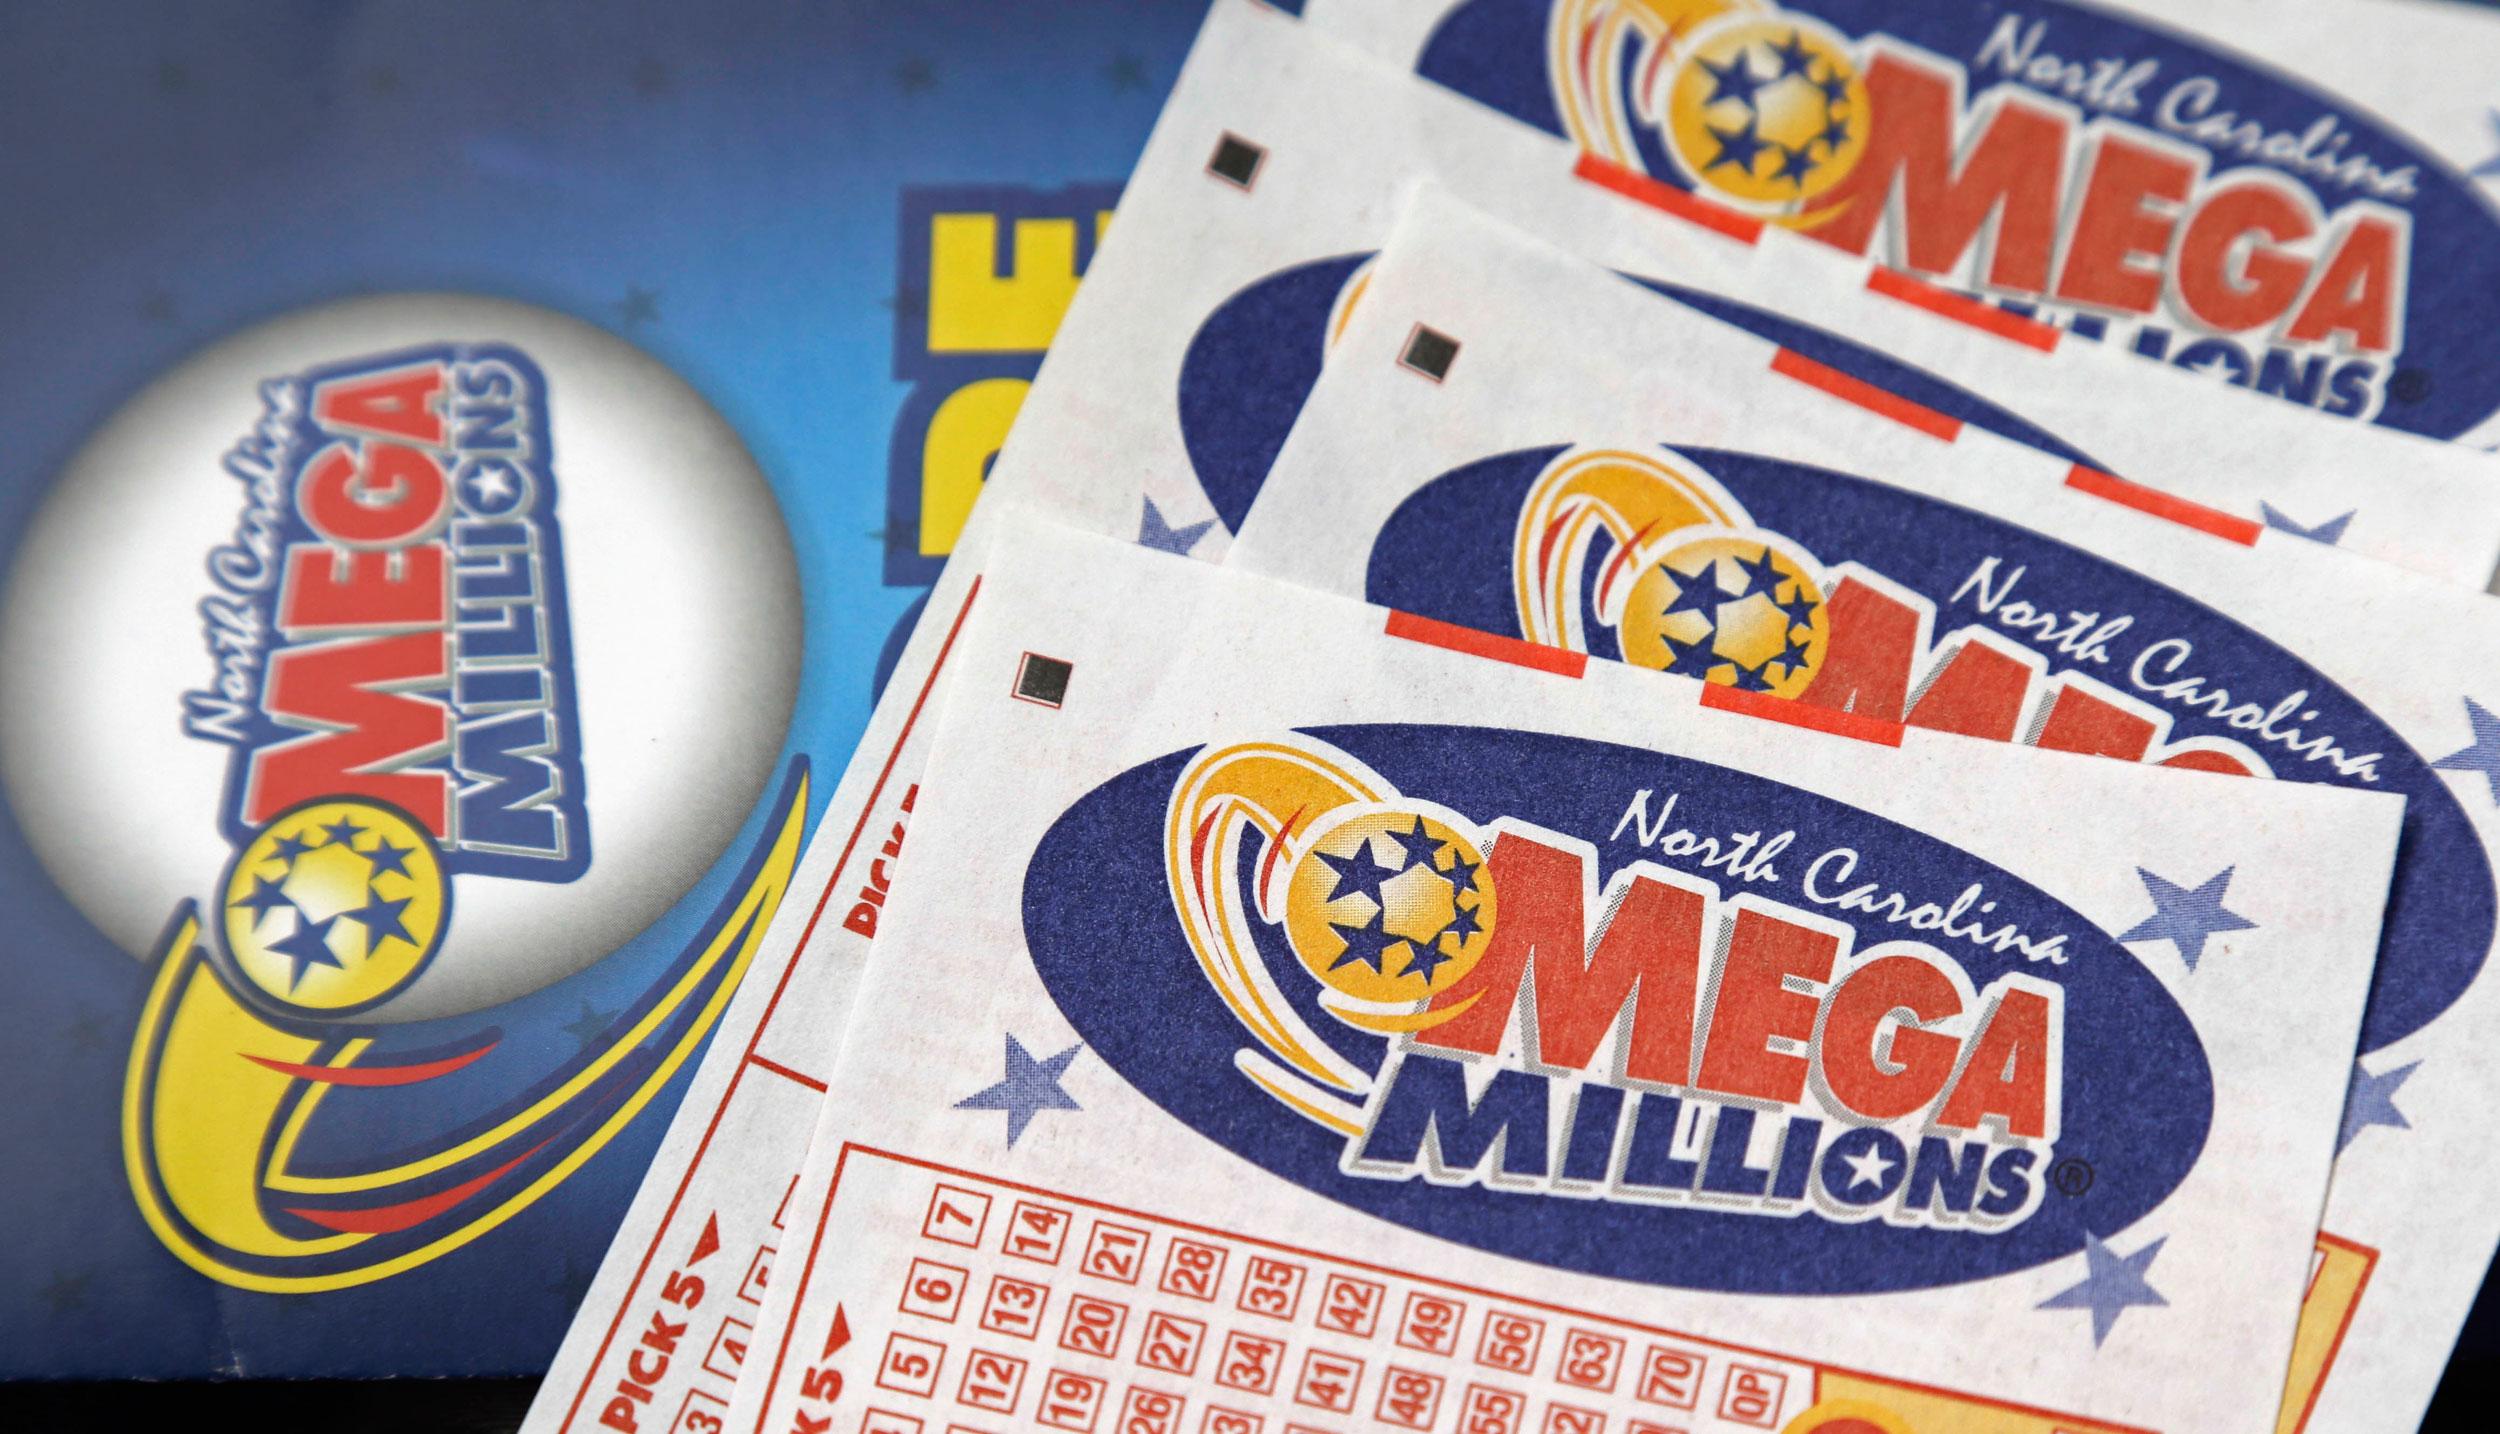 Mega Millions lottery tickets rest on a counter at a Pilot travel centre near Burlington, N.C.